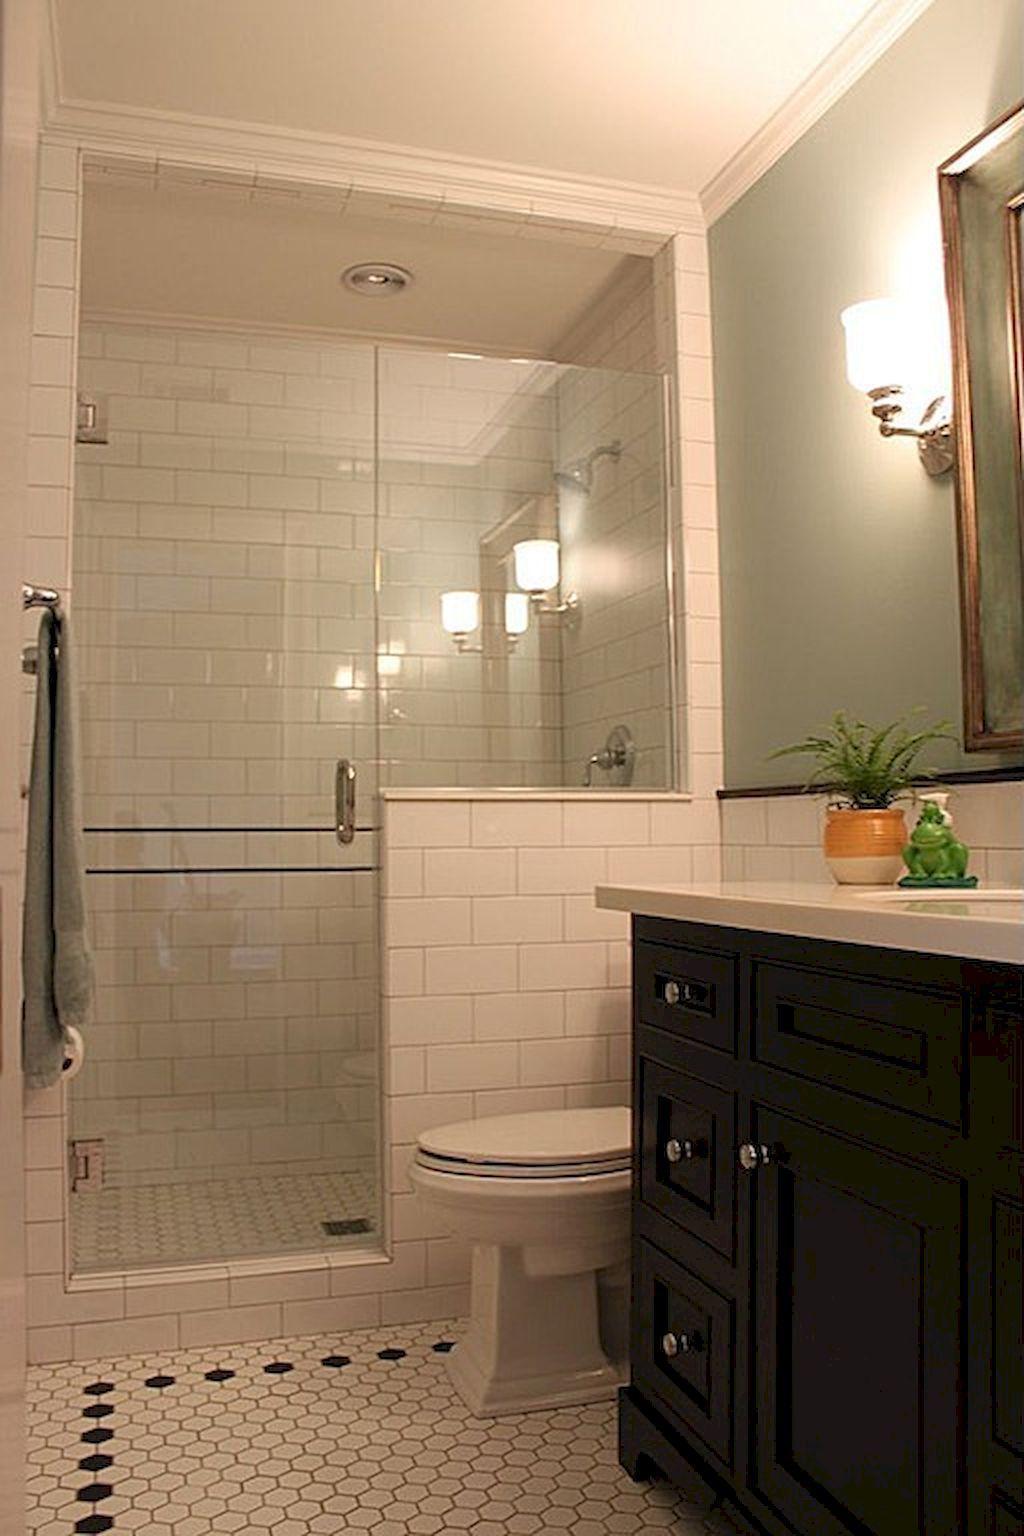 Basement Bathroom Ideas Low Ceiling Bathroomideasforbasement Basement Bathroom With Images Bathroom Remodel Cost Basement Bathroom Remodeling Small Bathroom With Shower